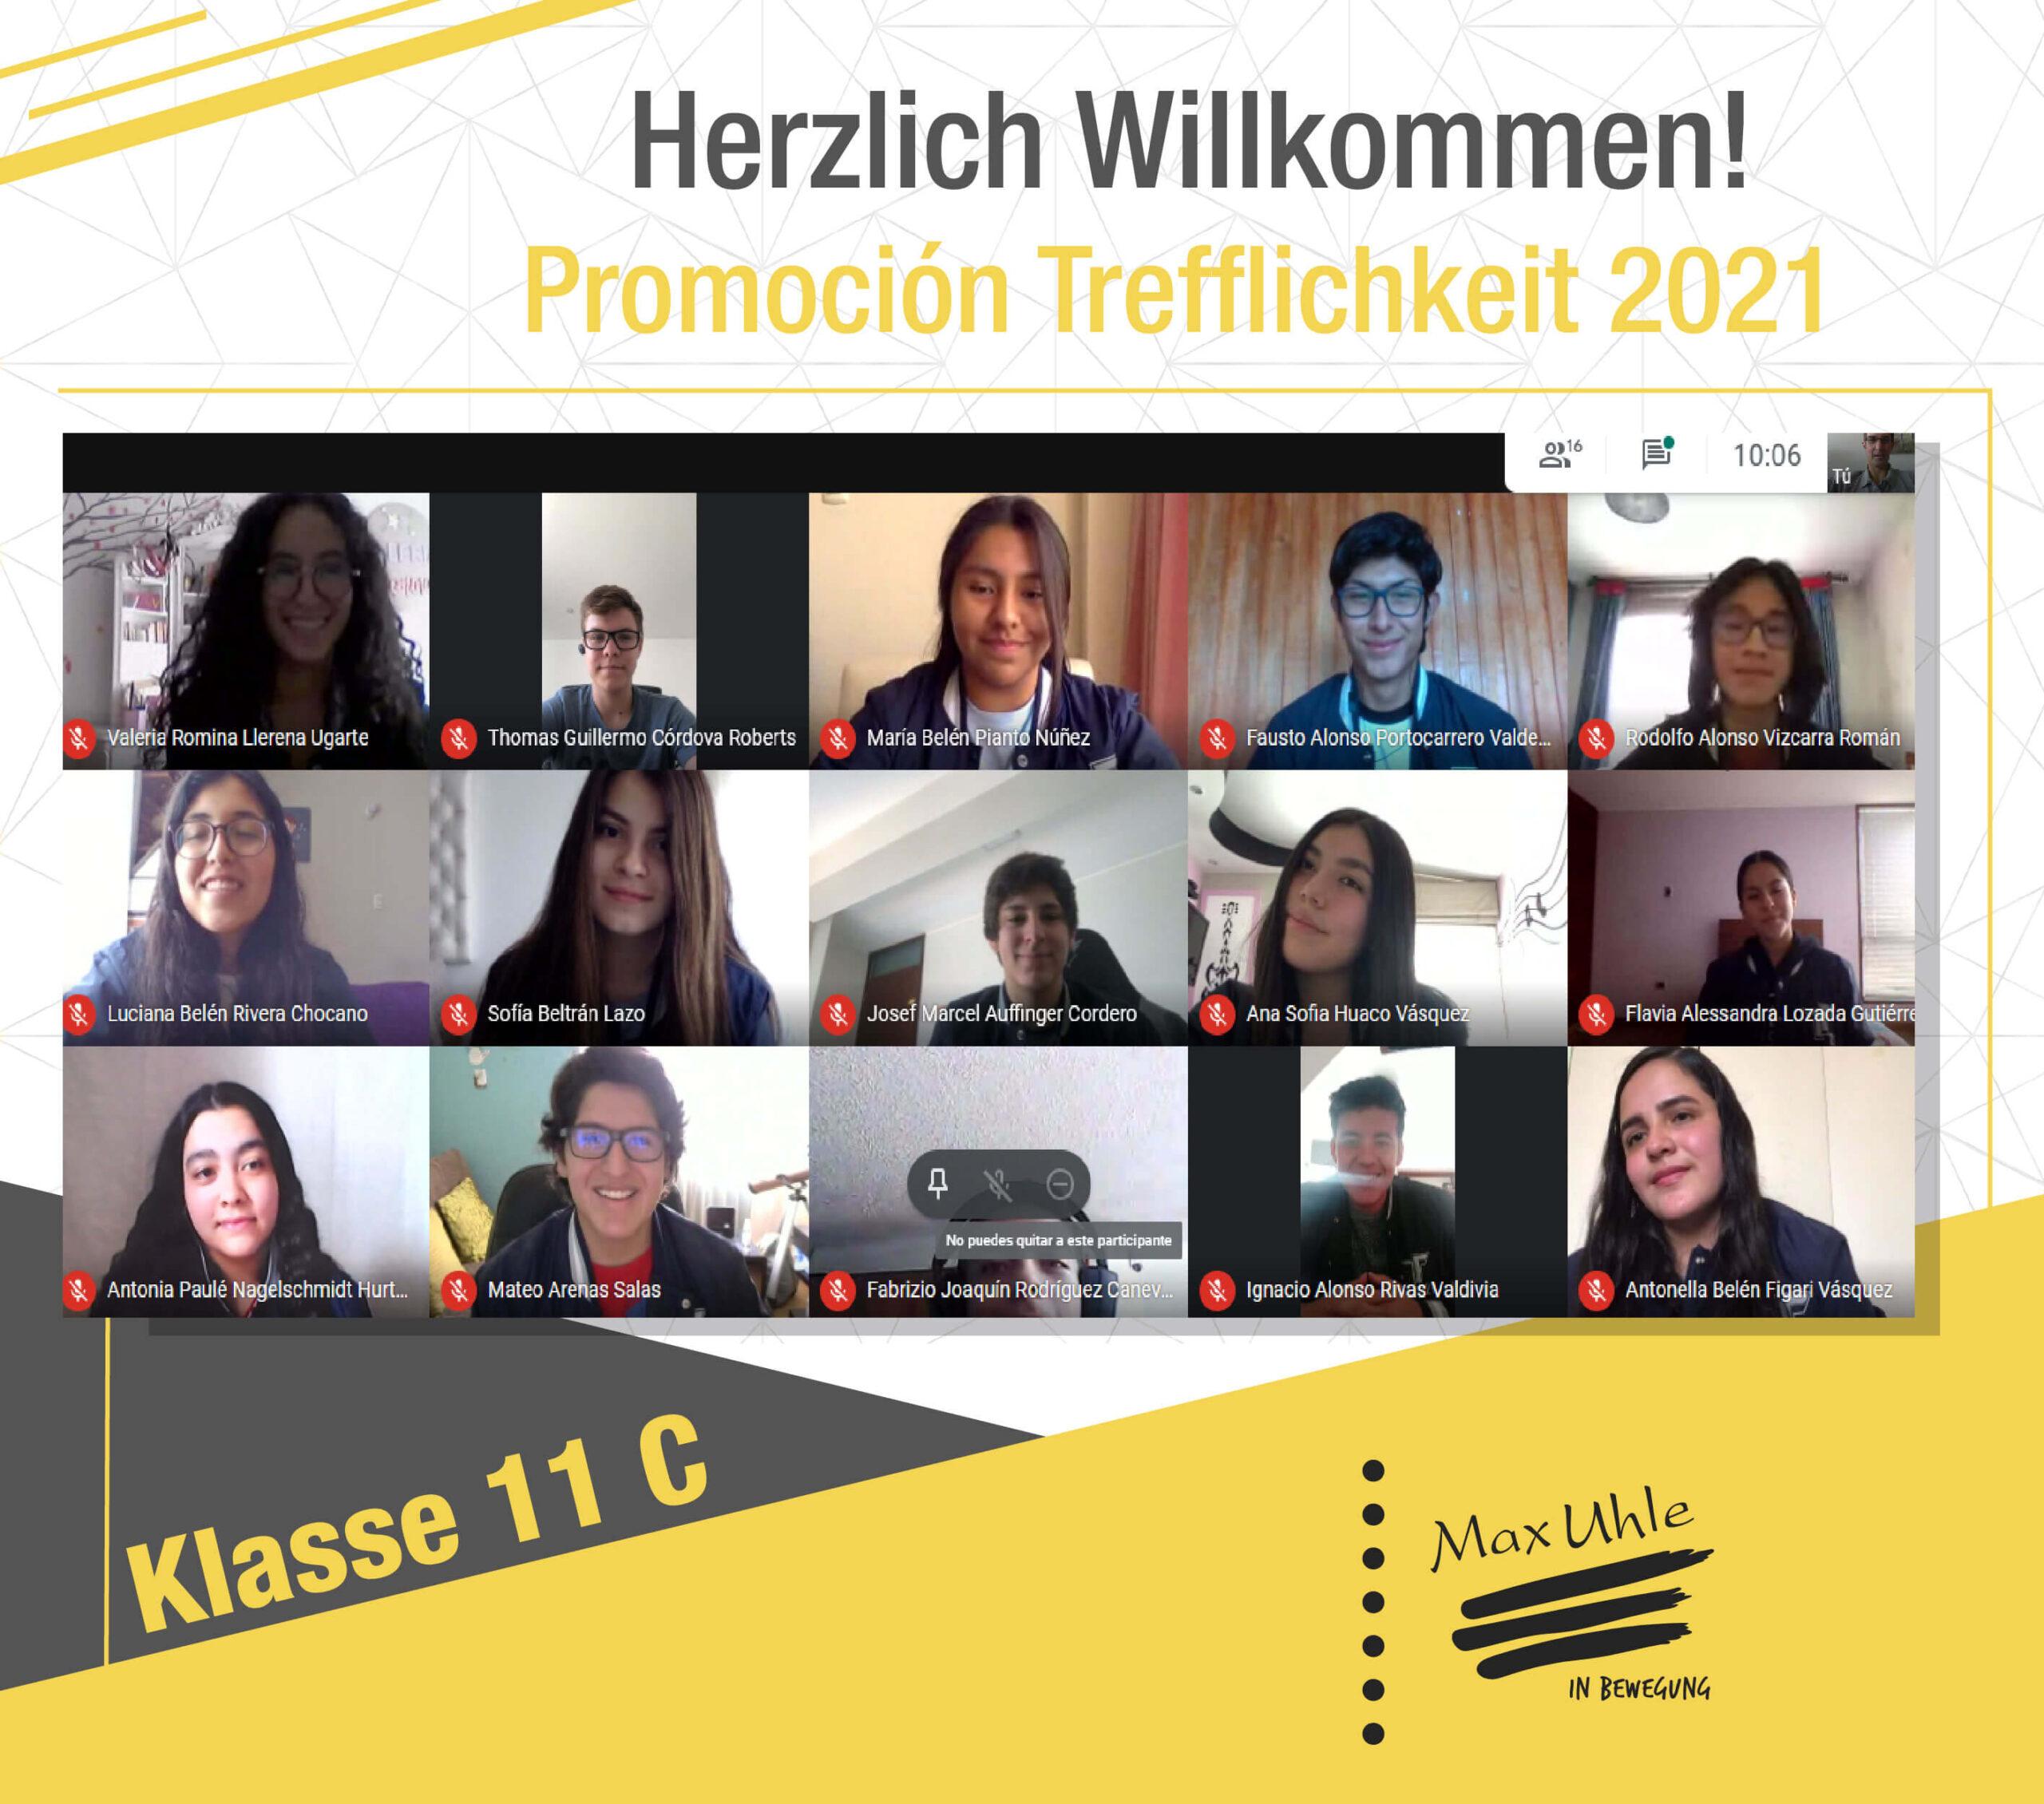 regreso a clases promocion trefflichkeit 2021 clase 11C